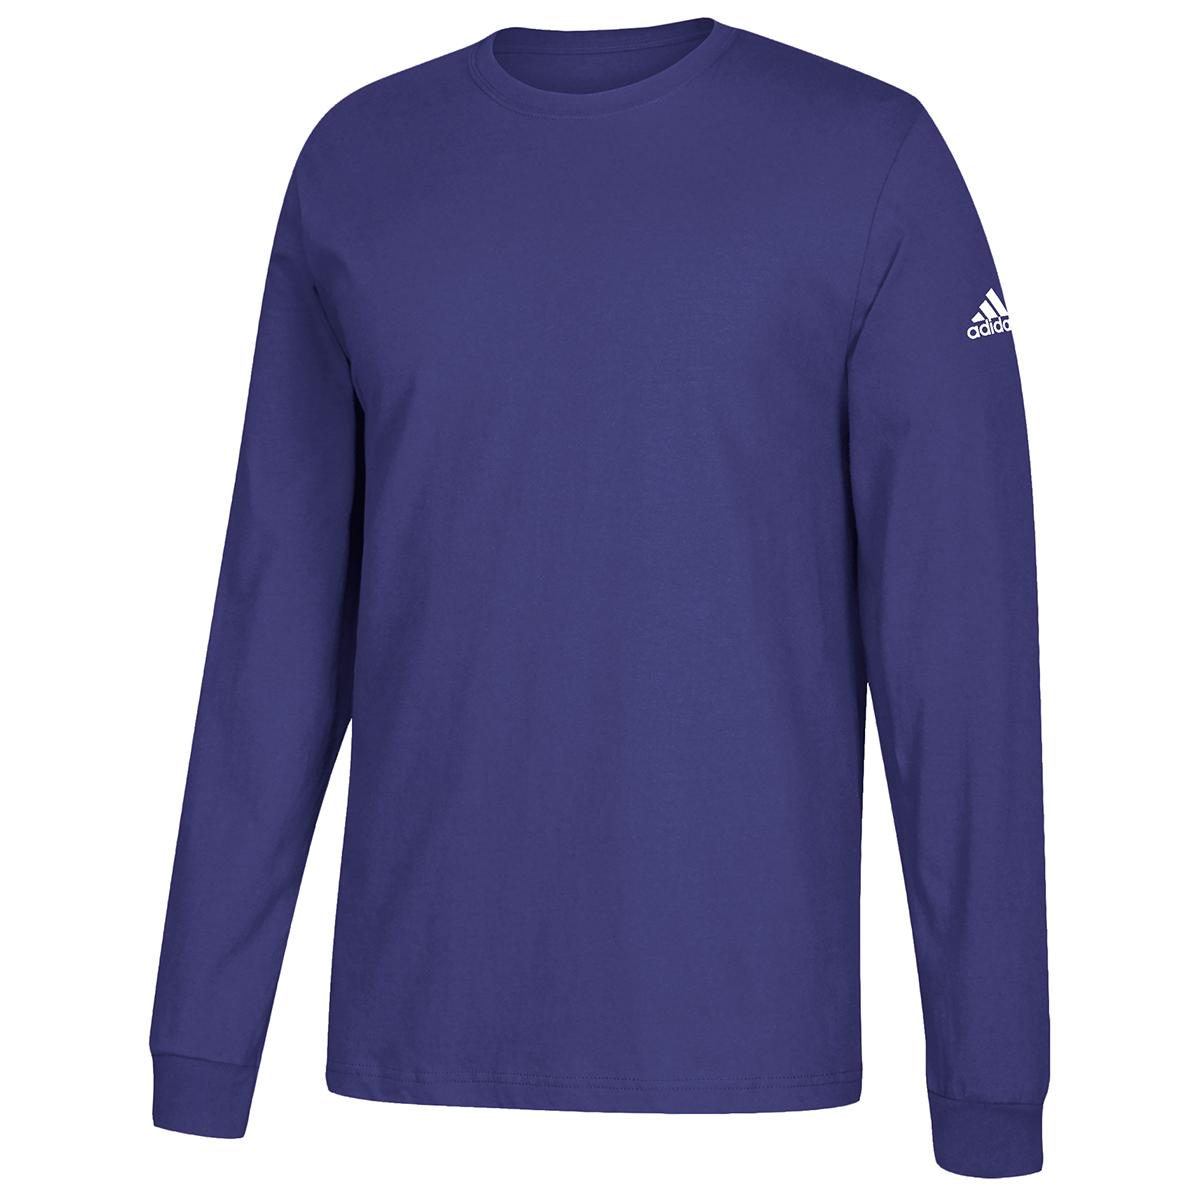 Adidas Men's Performance Long-Sleeve Tee - Purple, S